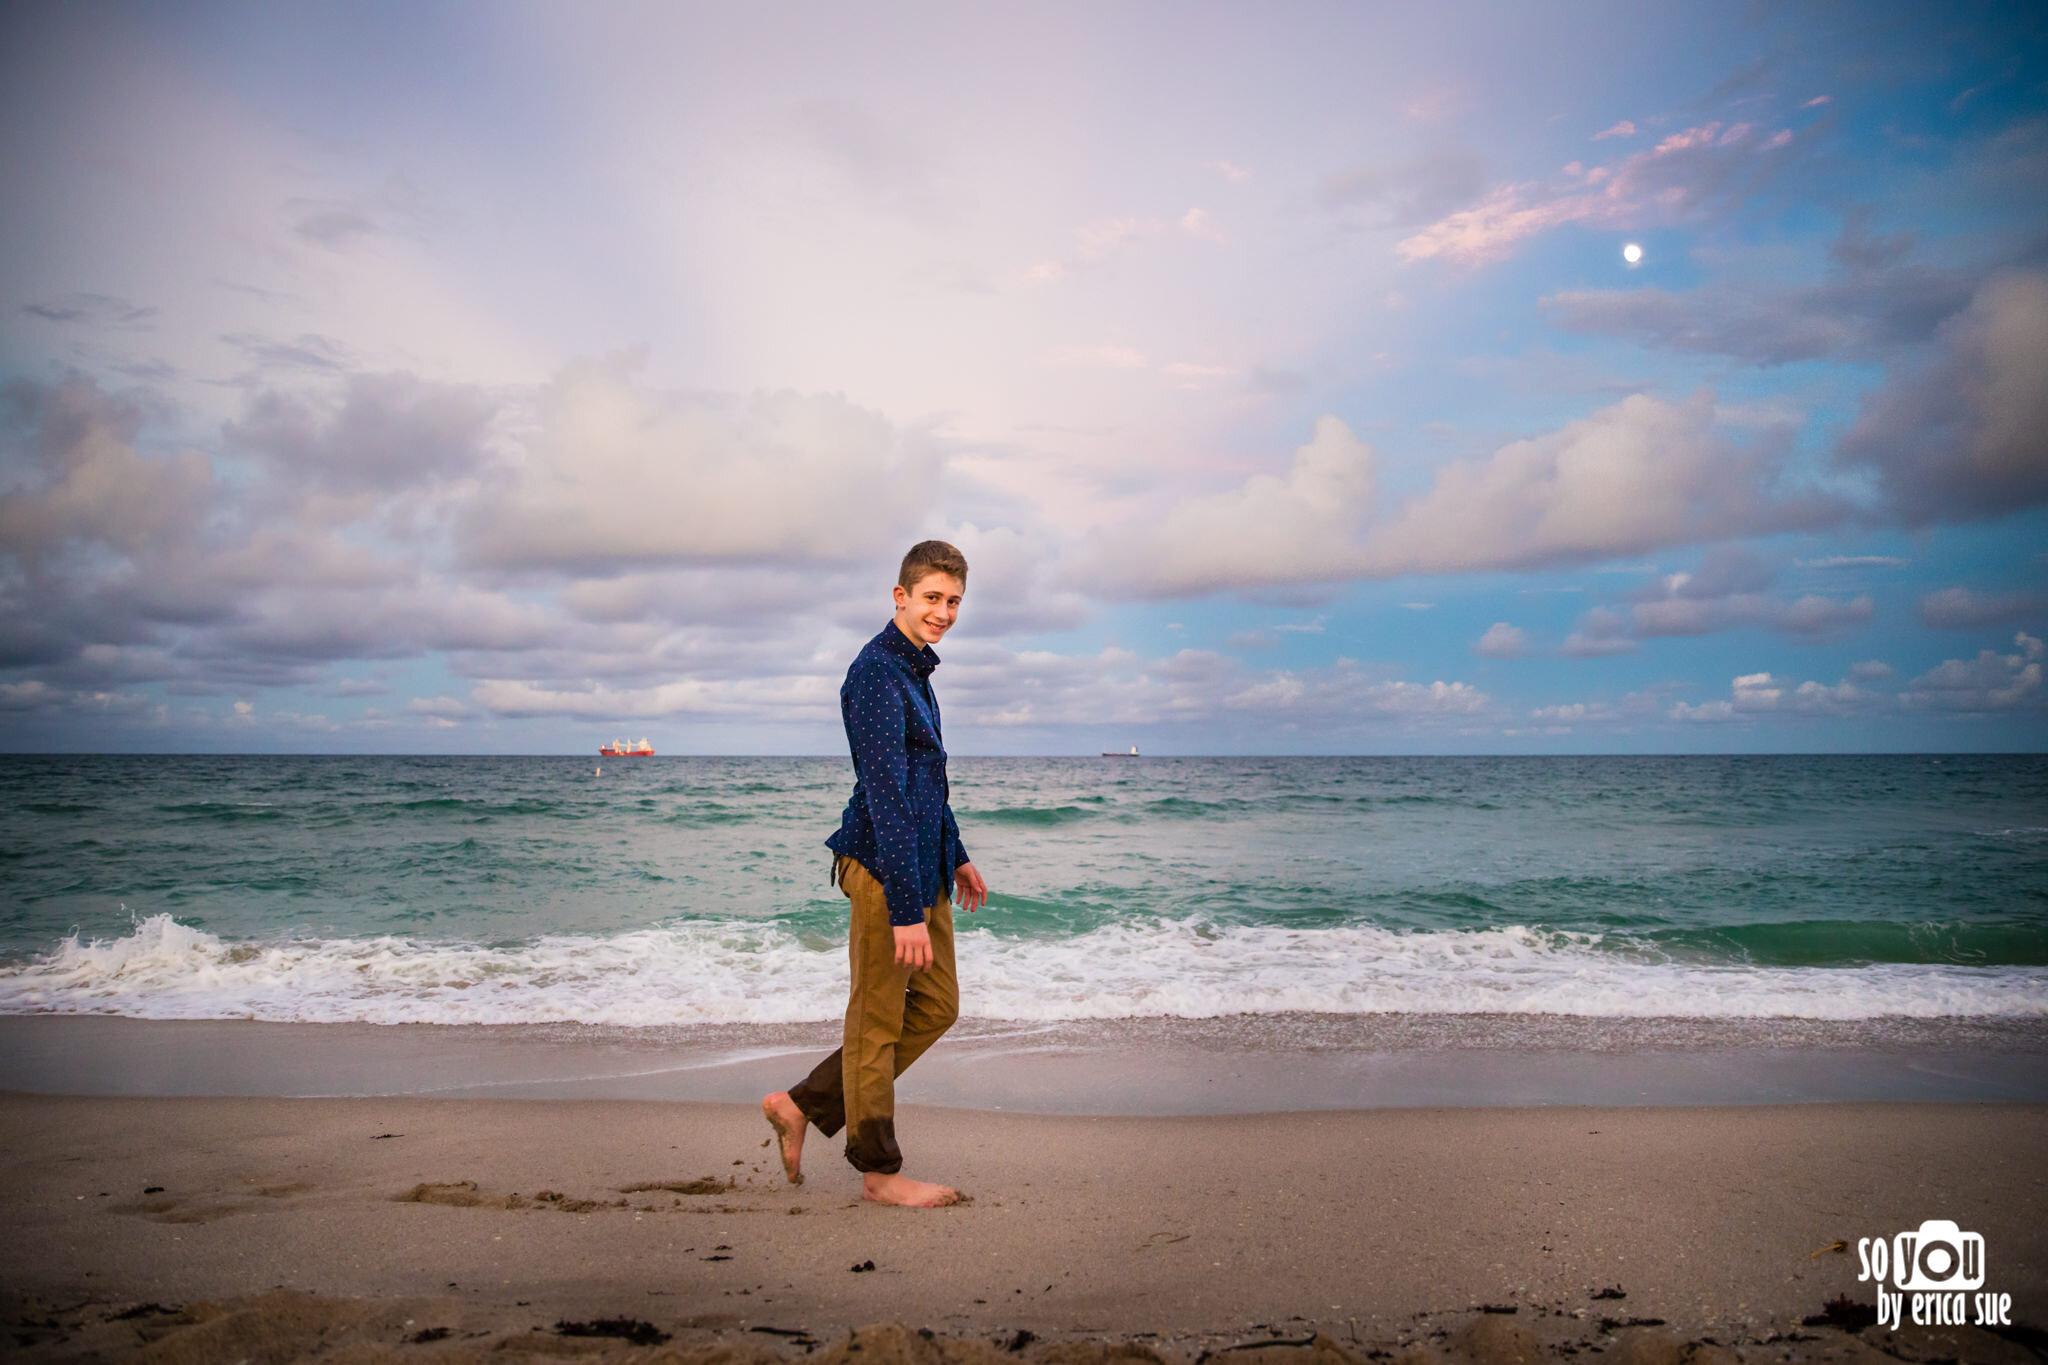 so-you-by-erica-sue-ft-lauderdale-beach-basketball-mitzvah-pre-shoot-9934.JPG